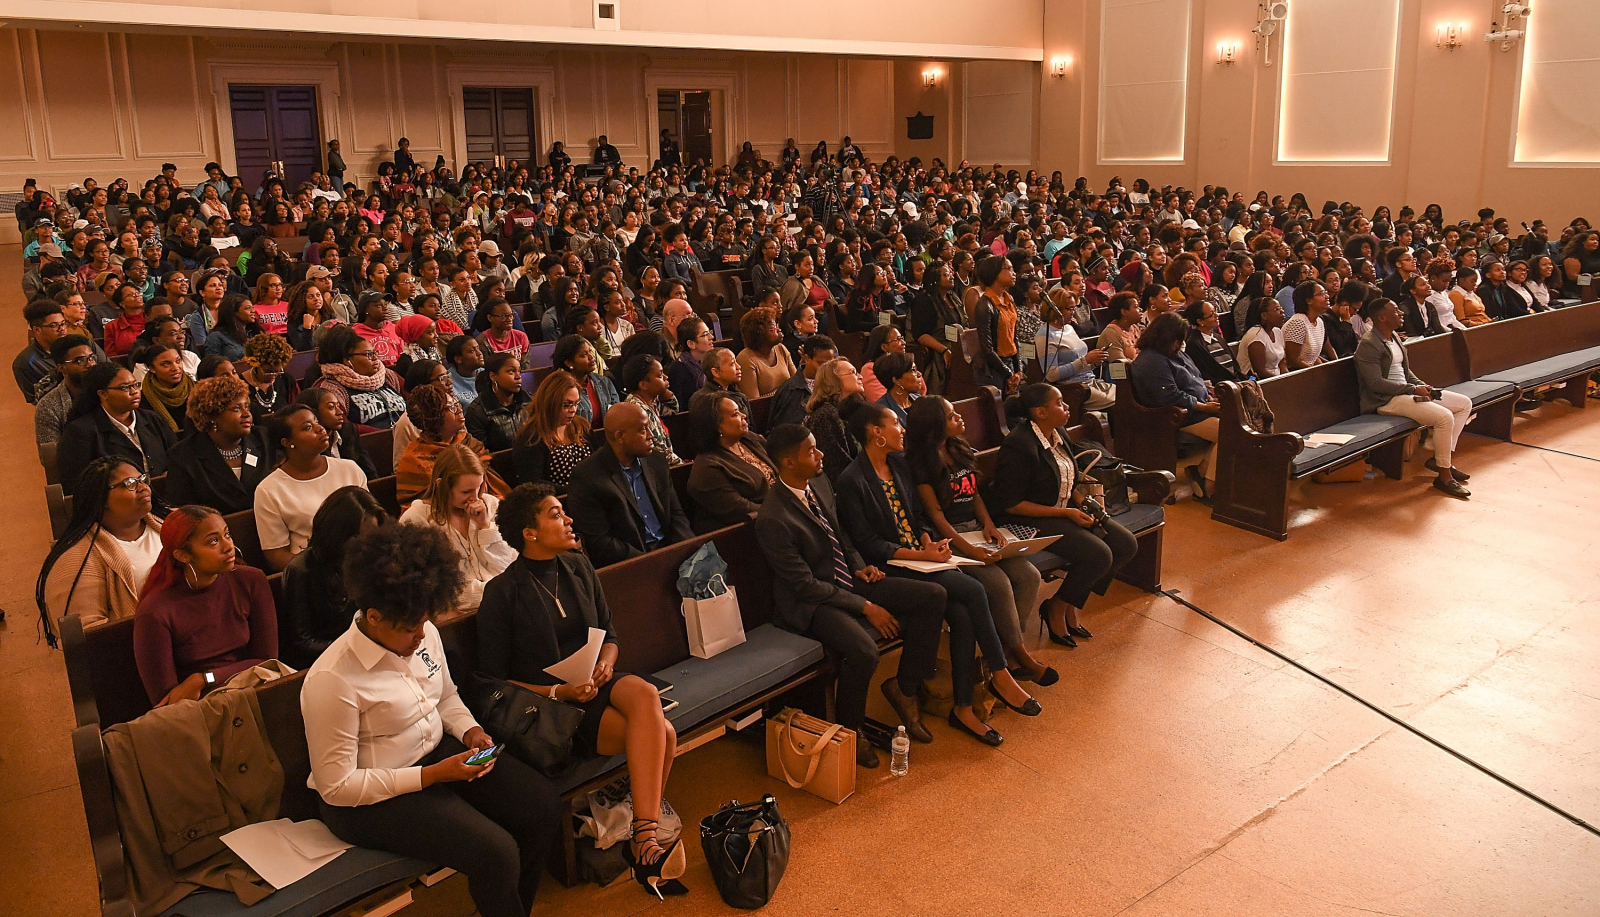 Black college students, Spelman College, Georgia